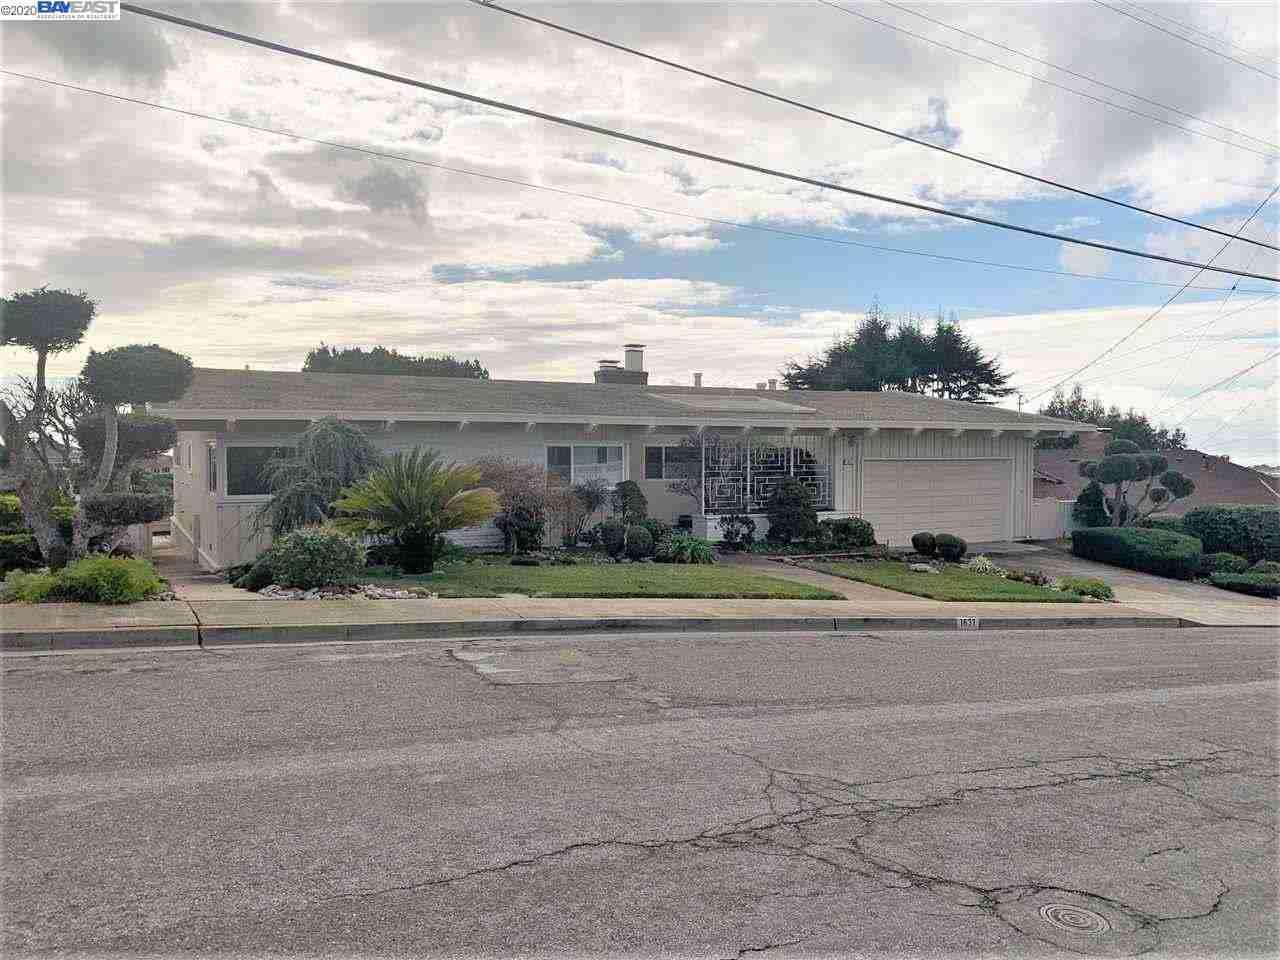 1637 View Dr San Leandro, CA, 94577